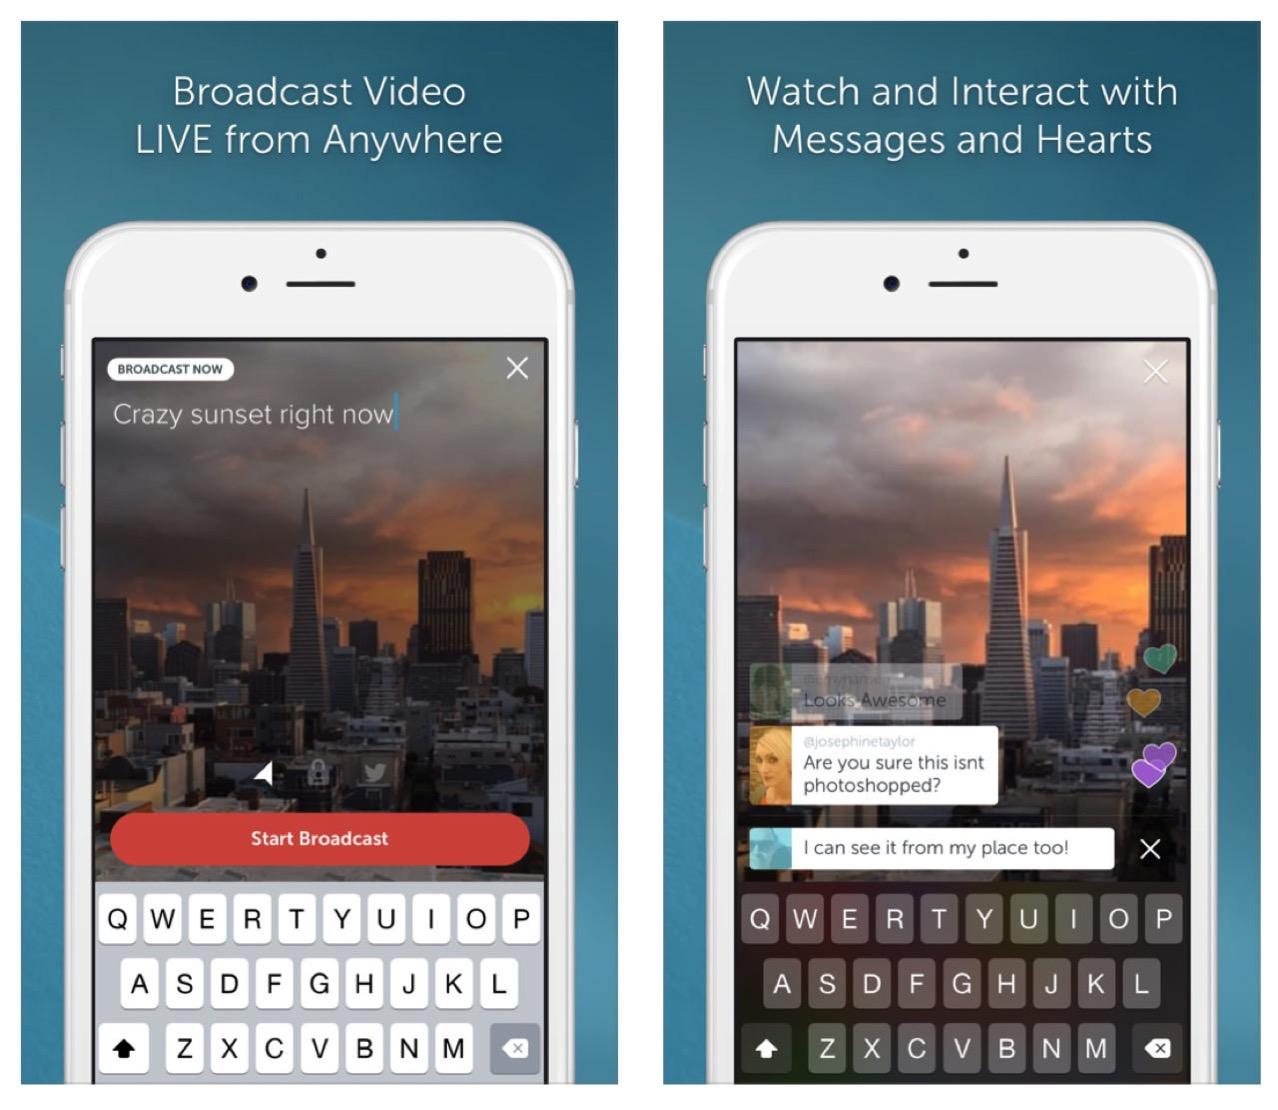 Periscopeはライブ動画や生放送を簡単に楽しめる動画配信サービス